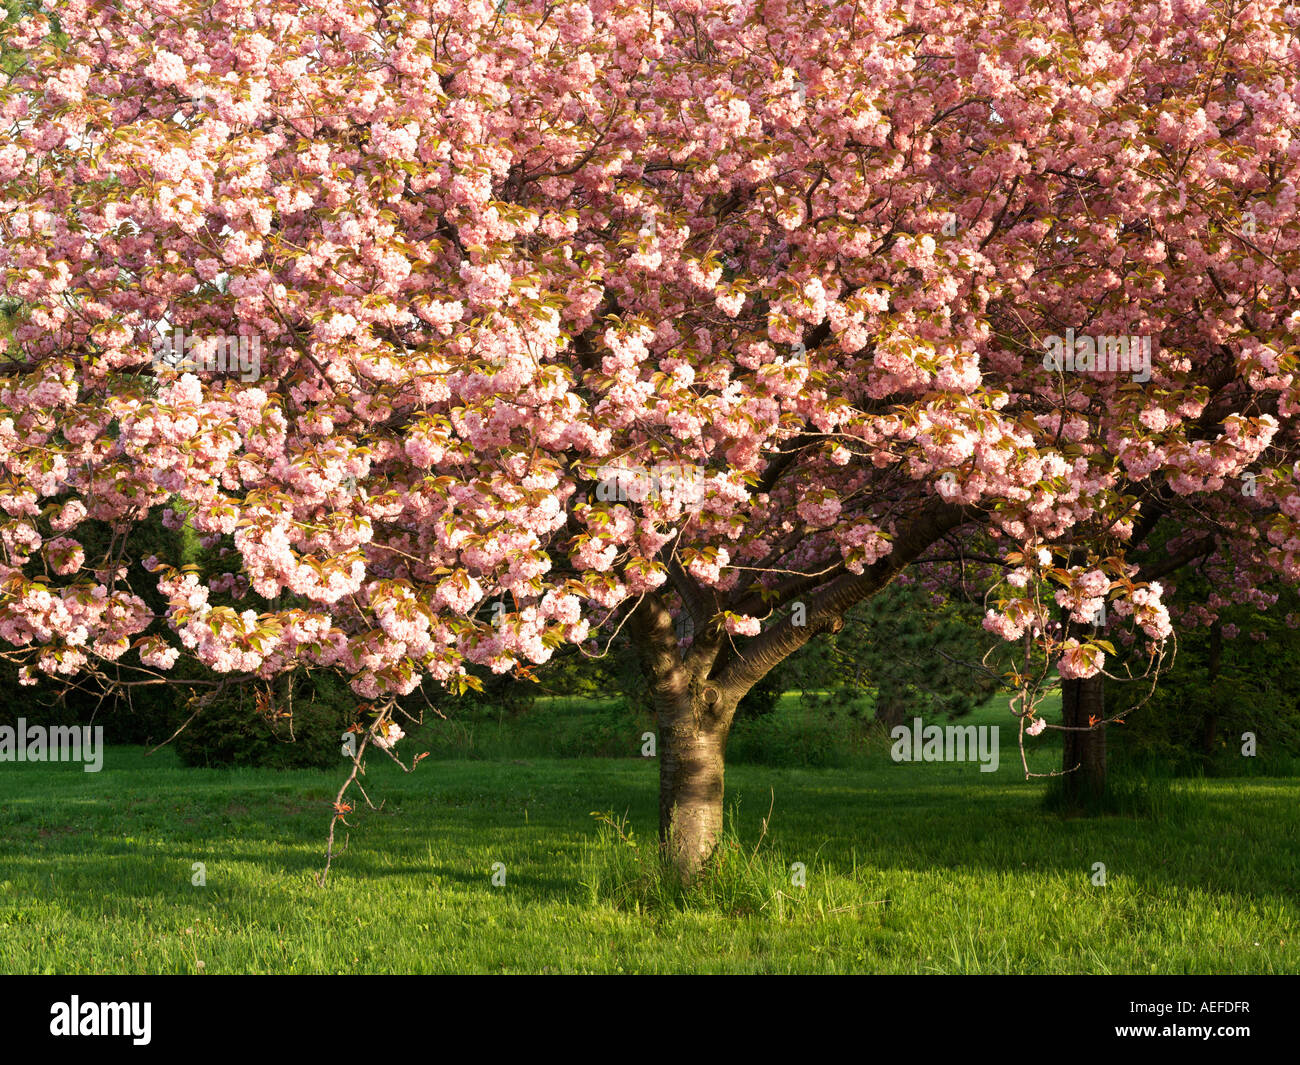 Canada Ontario Niagara Falls School of Horticulture Japanese Flowering Cherry tree in bloom Prunus Serrulata family - Stock Image